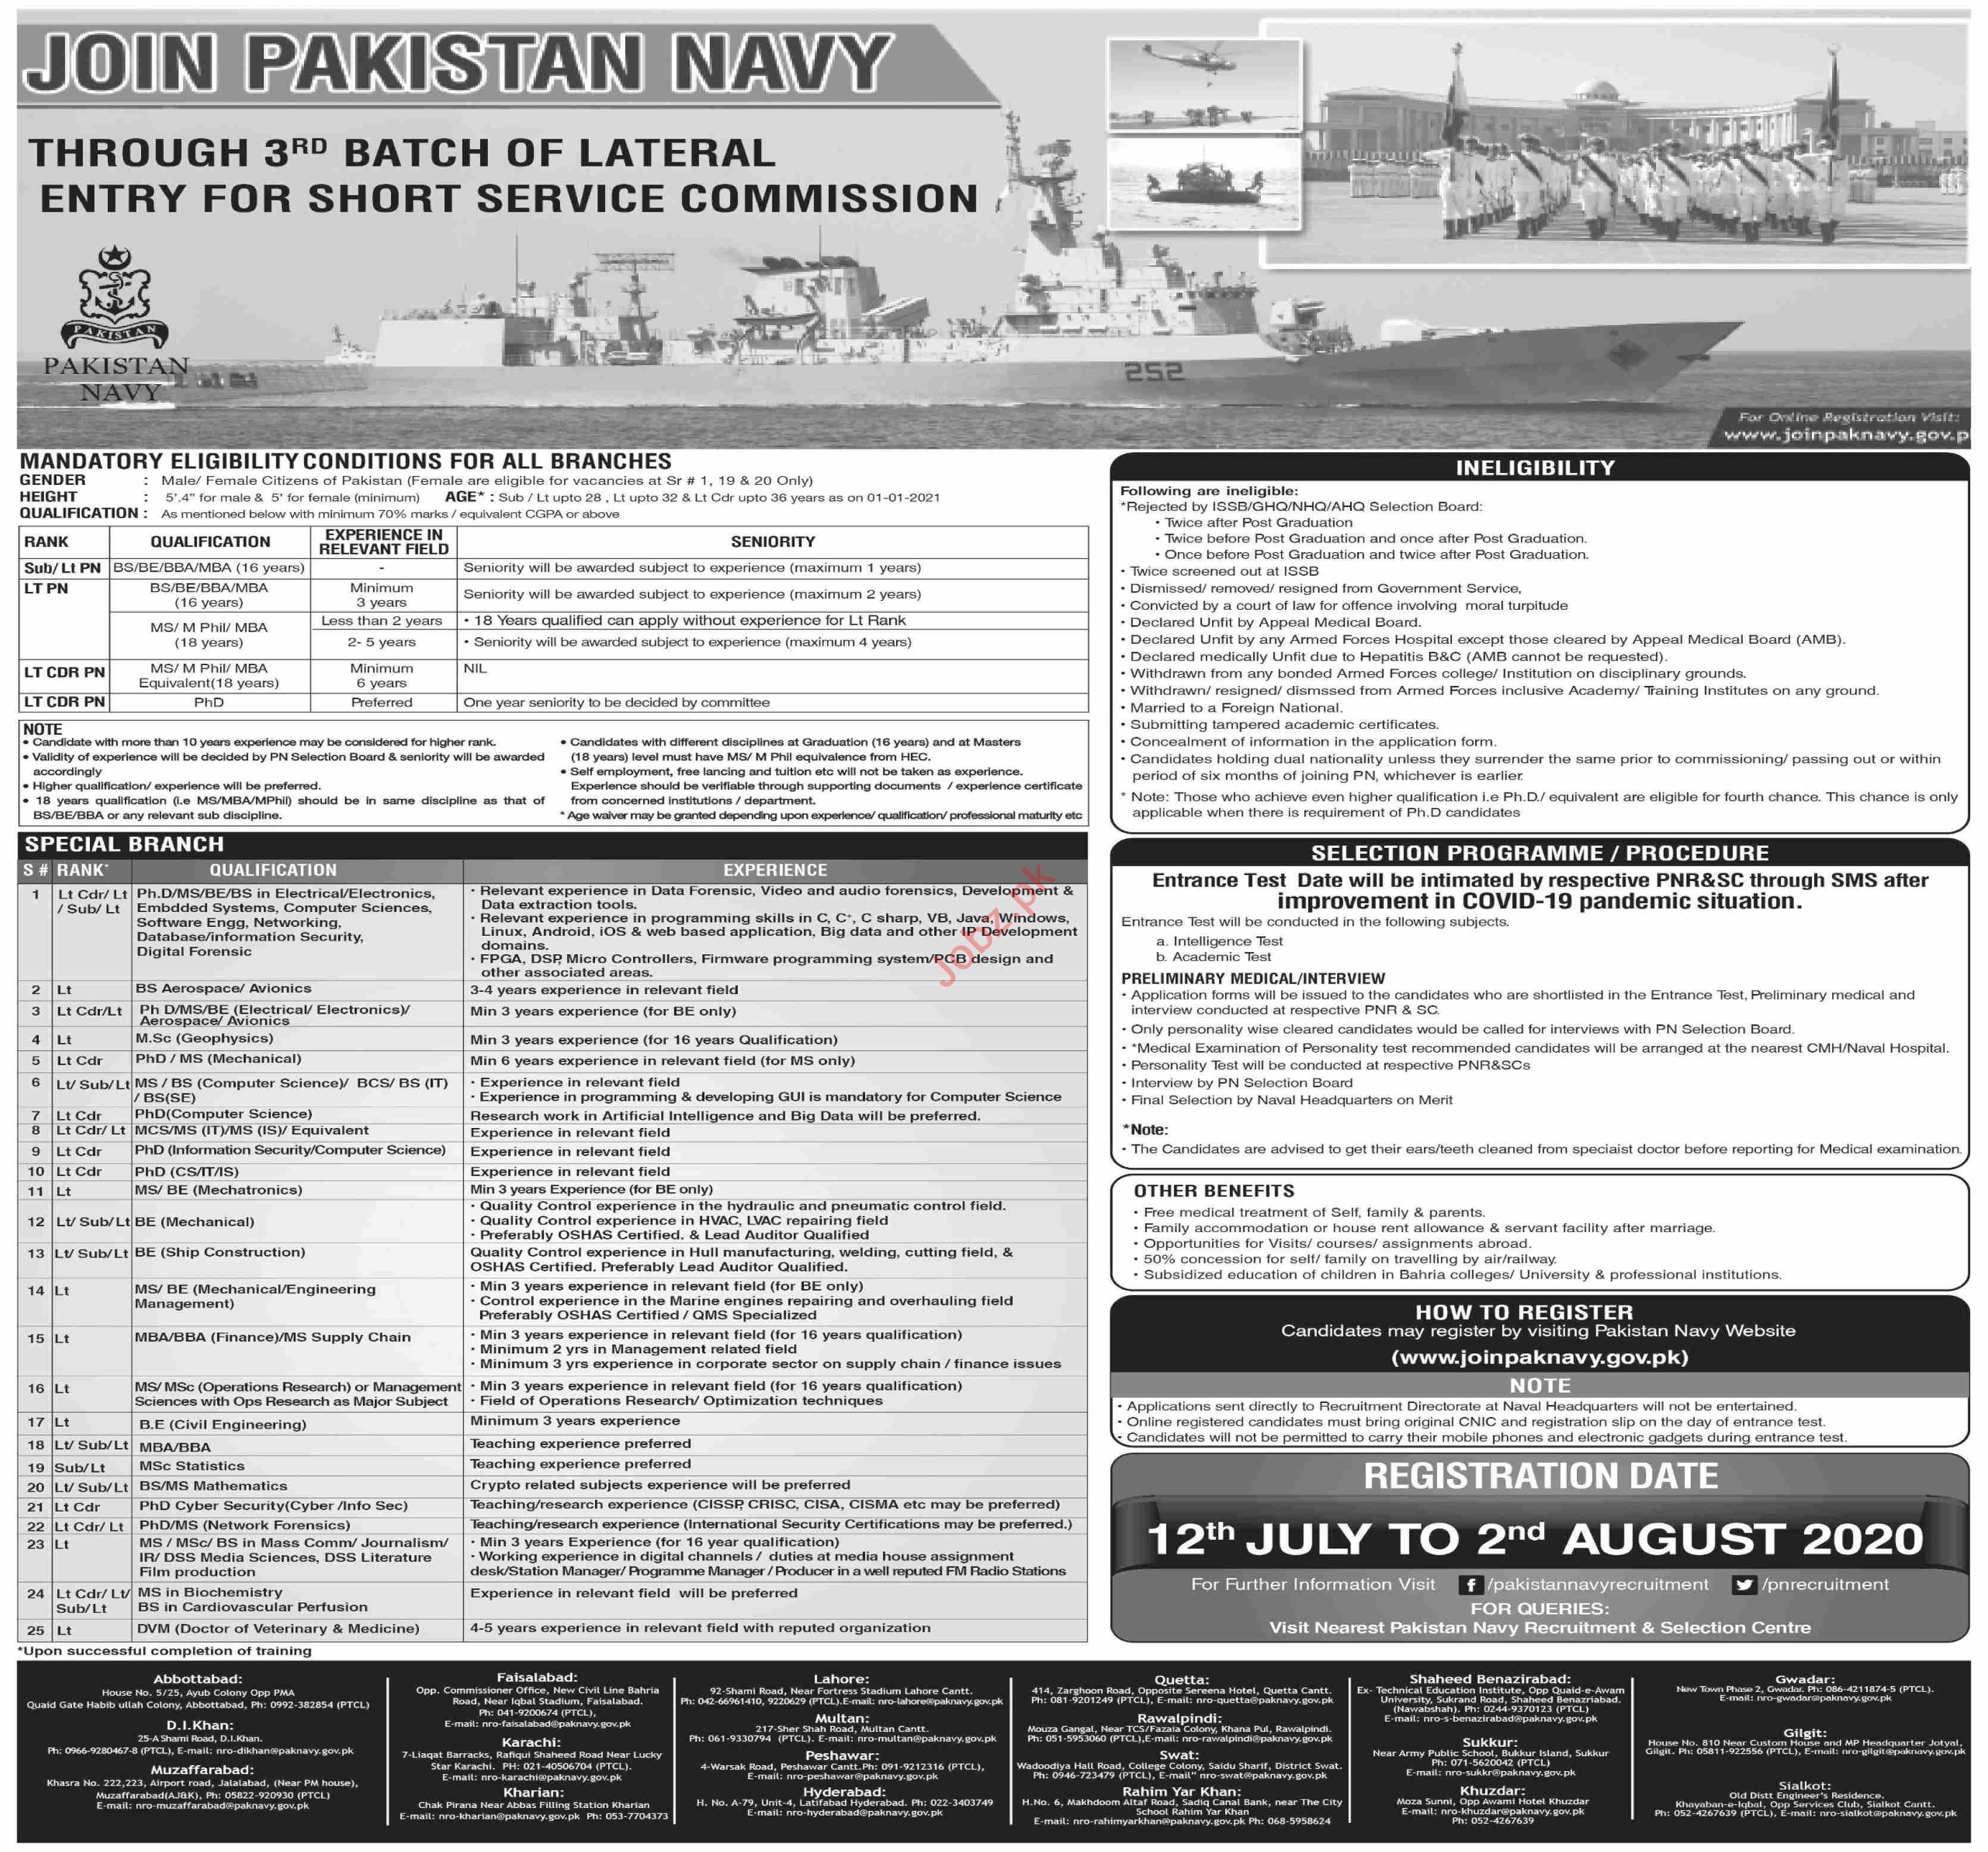 Join Pakistan Navy 3rd Batch Short Service Commission